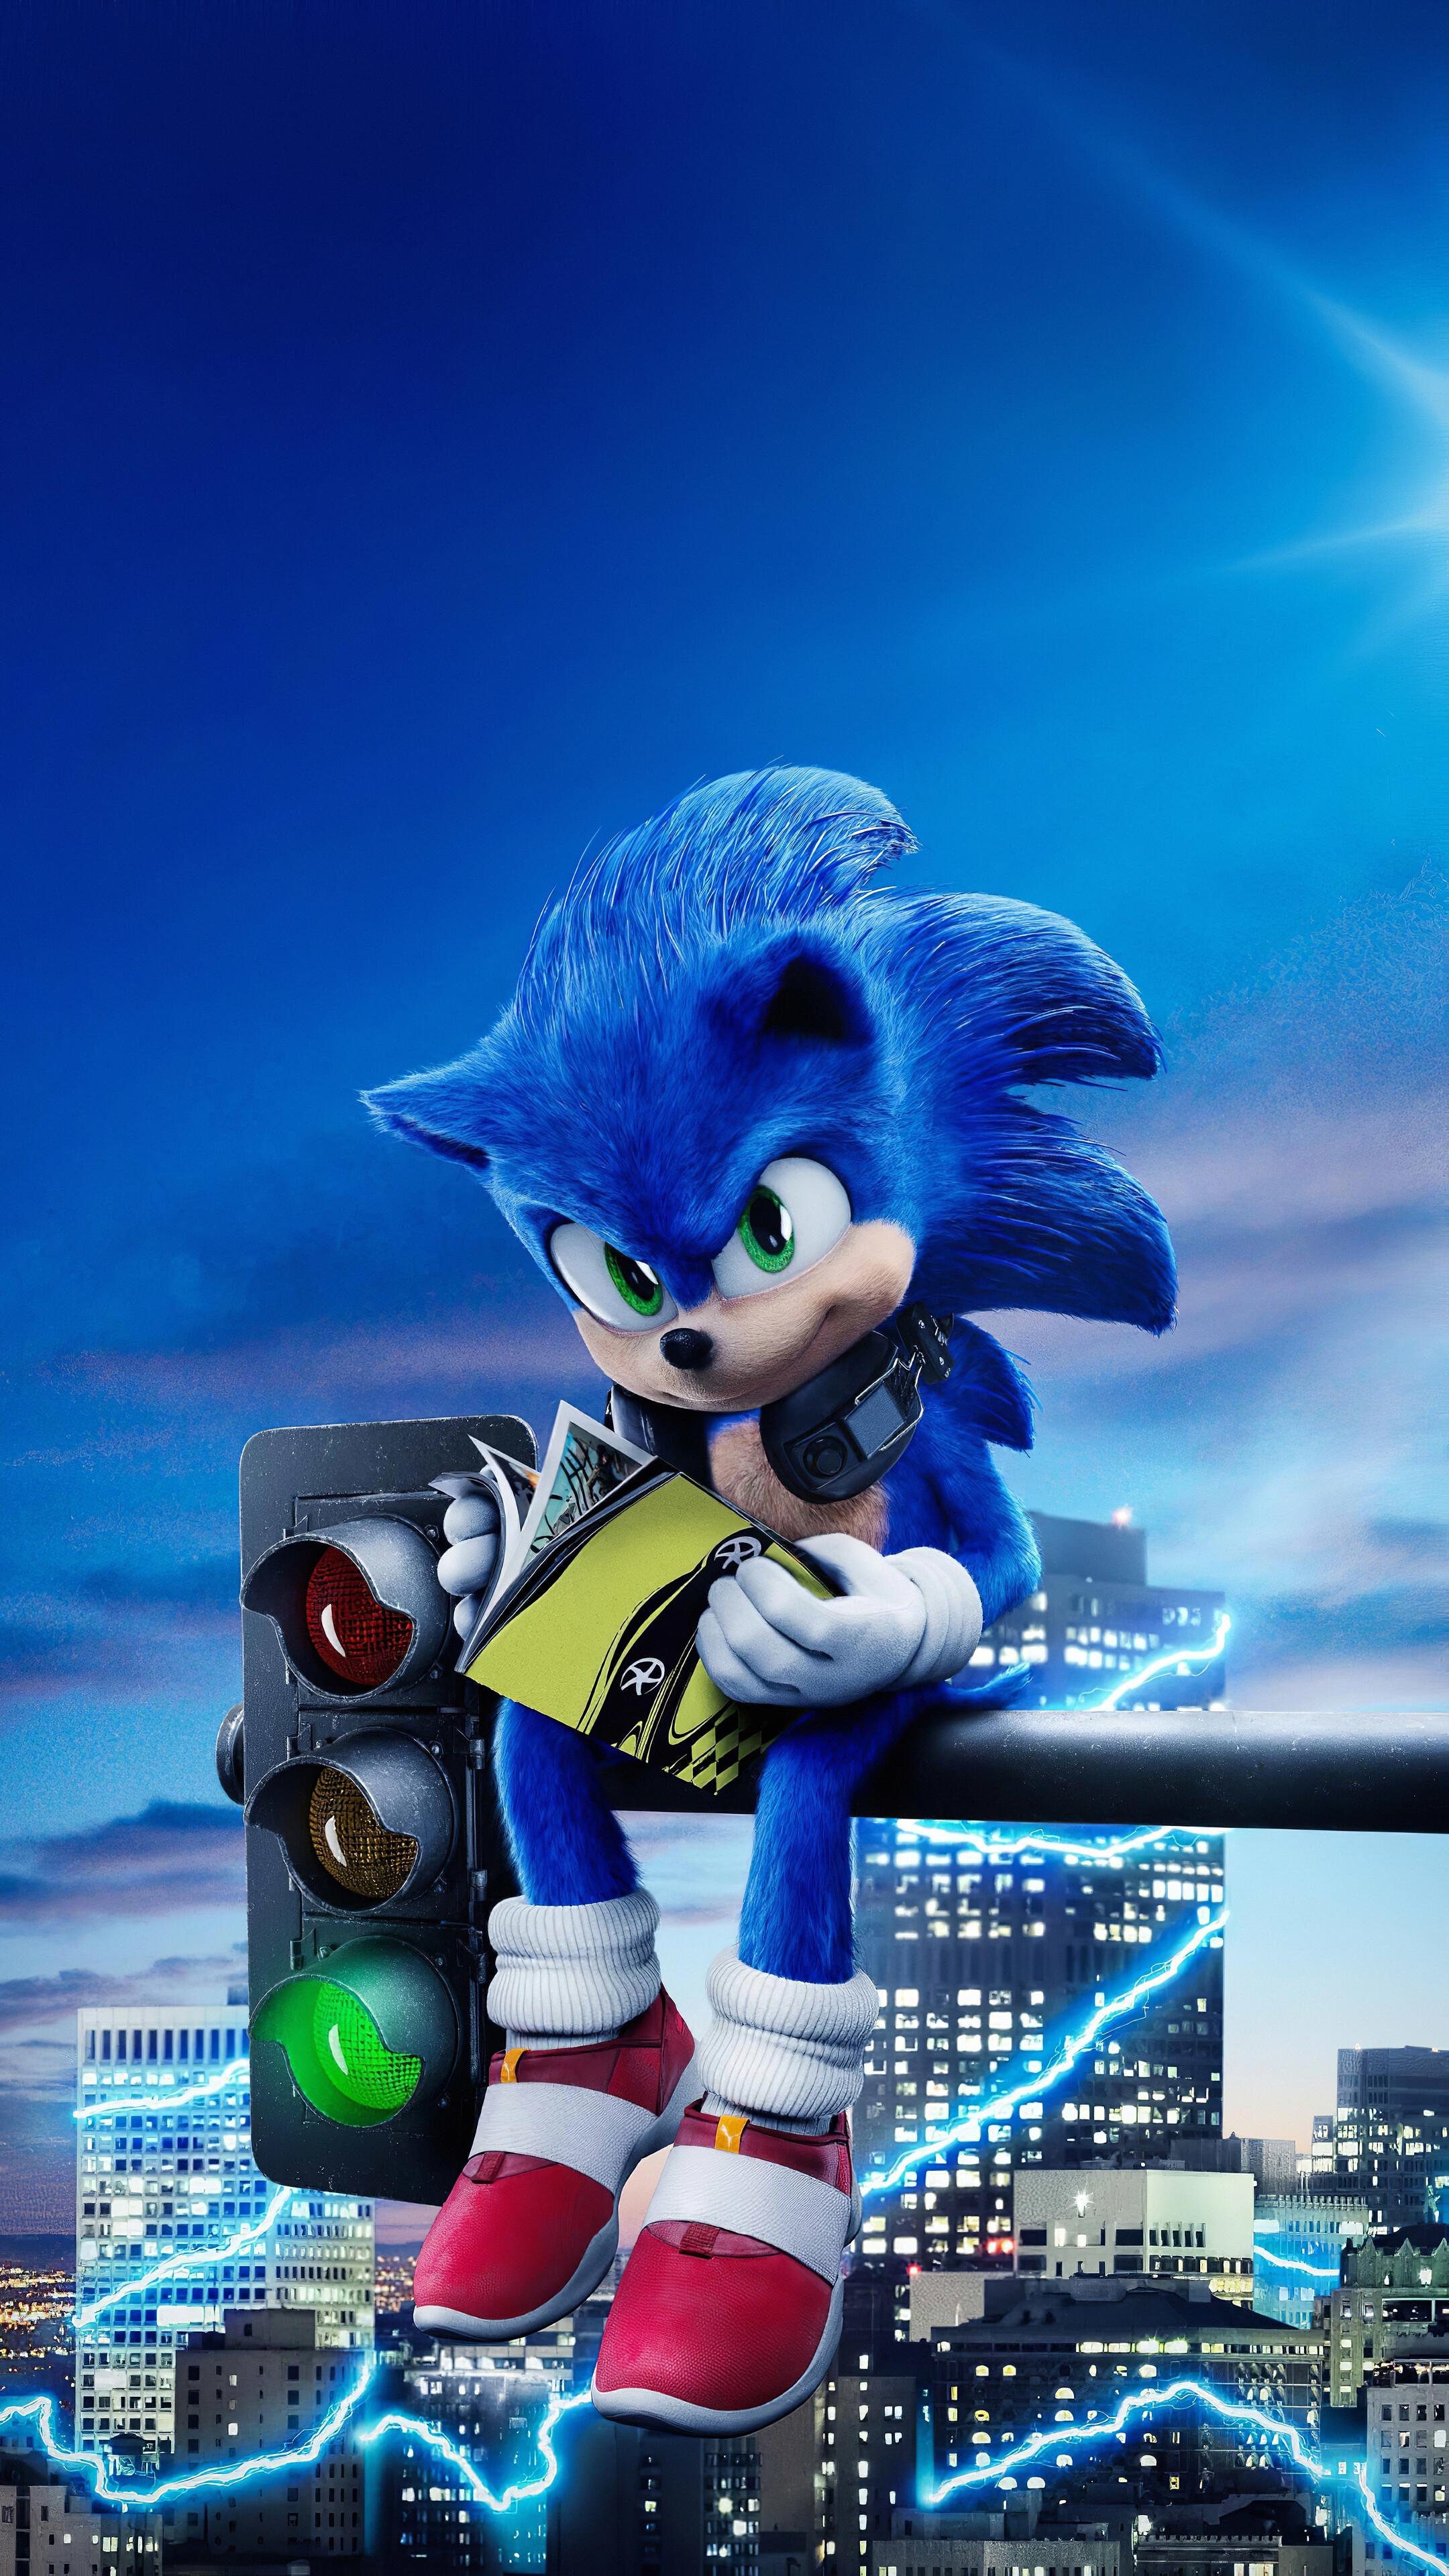 Sonic the Hedgehog Movie Poster 2020 4K Wallpaper 51447 2160x3840